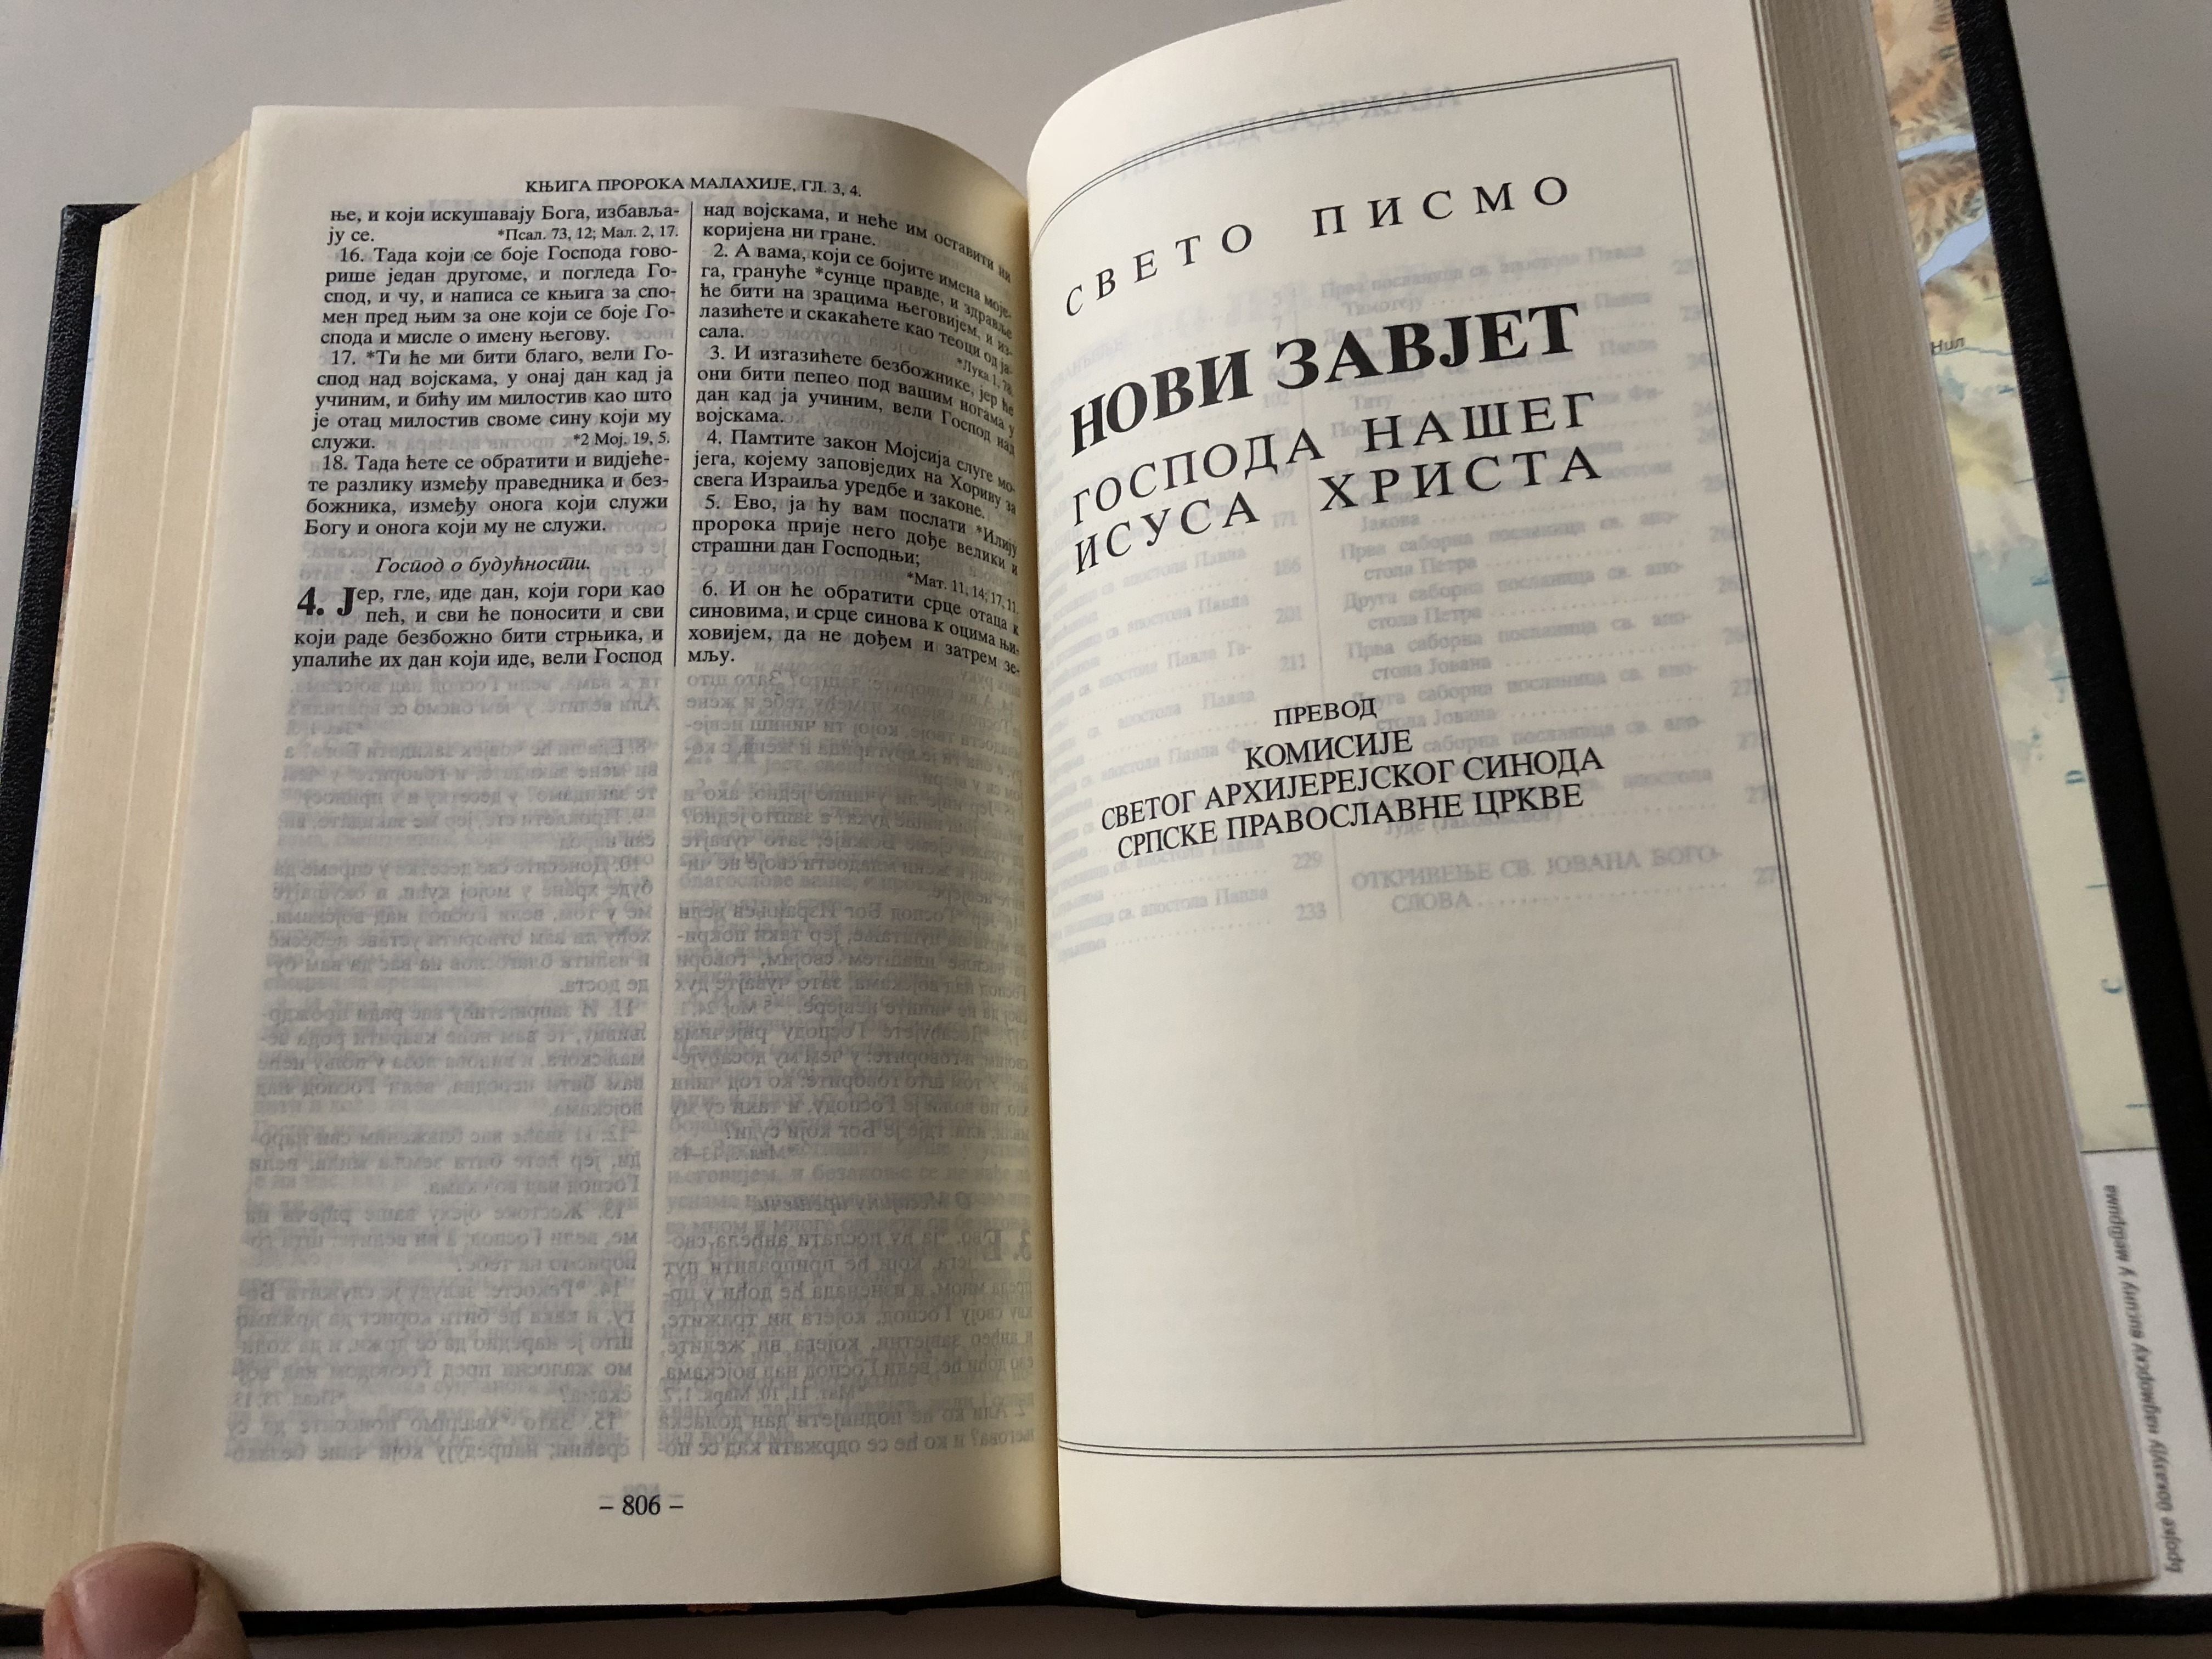 serbian-language-bible-burgundy-cover-with-golden-cross-cyrillic-script-043hs-32-.jpg